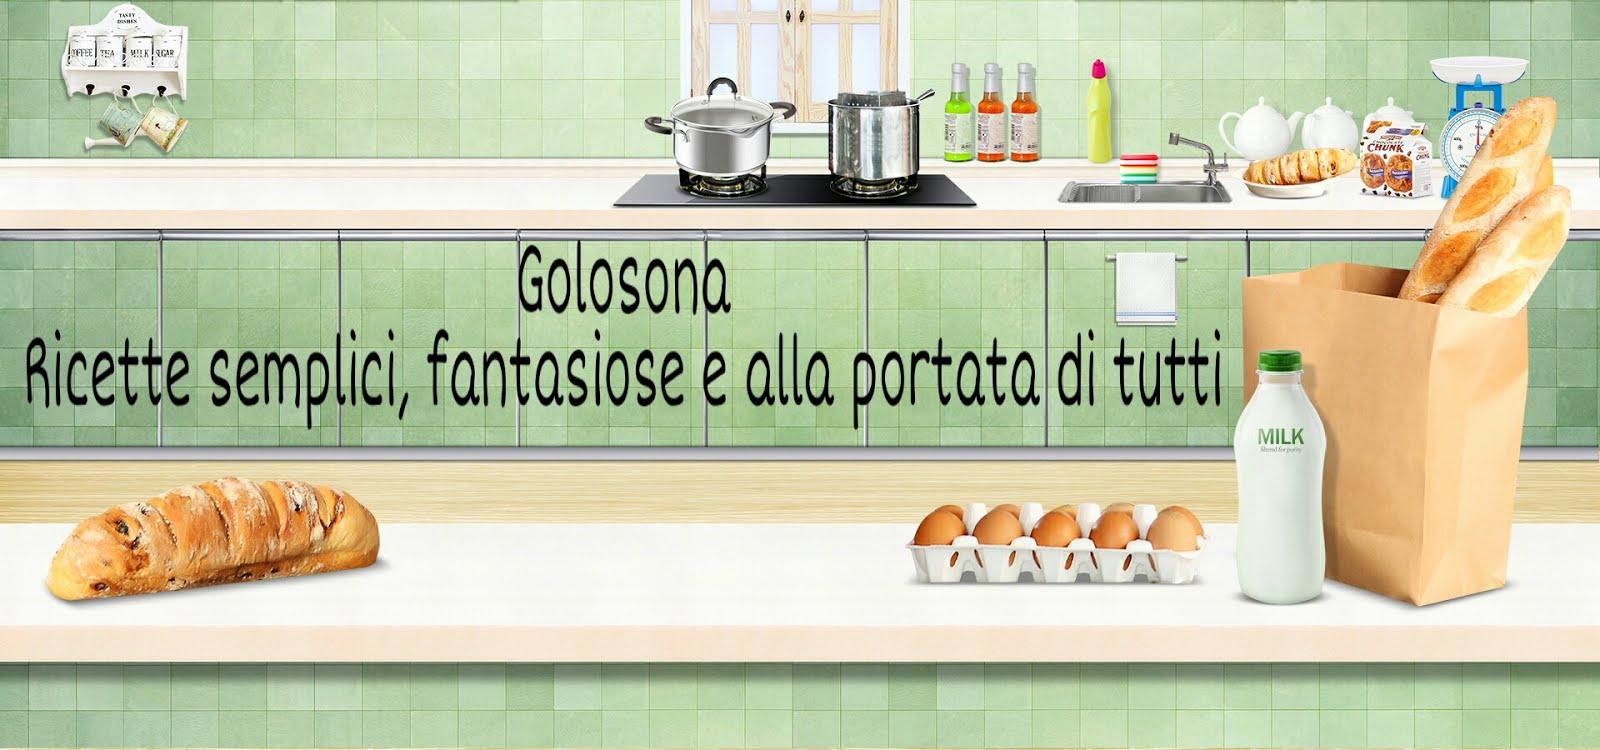 Golosona